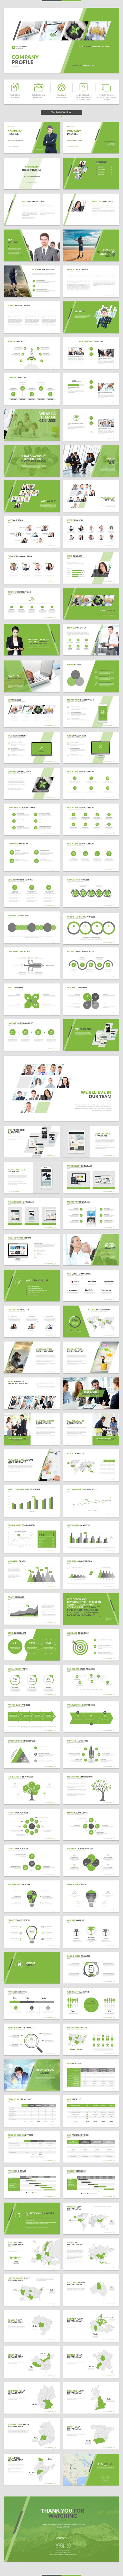 company profile - inspirational profile - brand profile - portfolio - powerpoint - company profile powerpoint - best company profile - company profile sampe